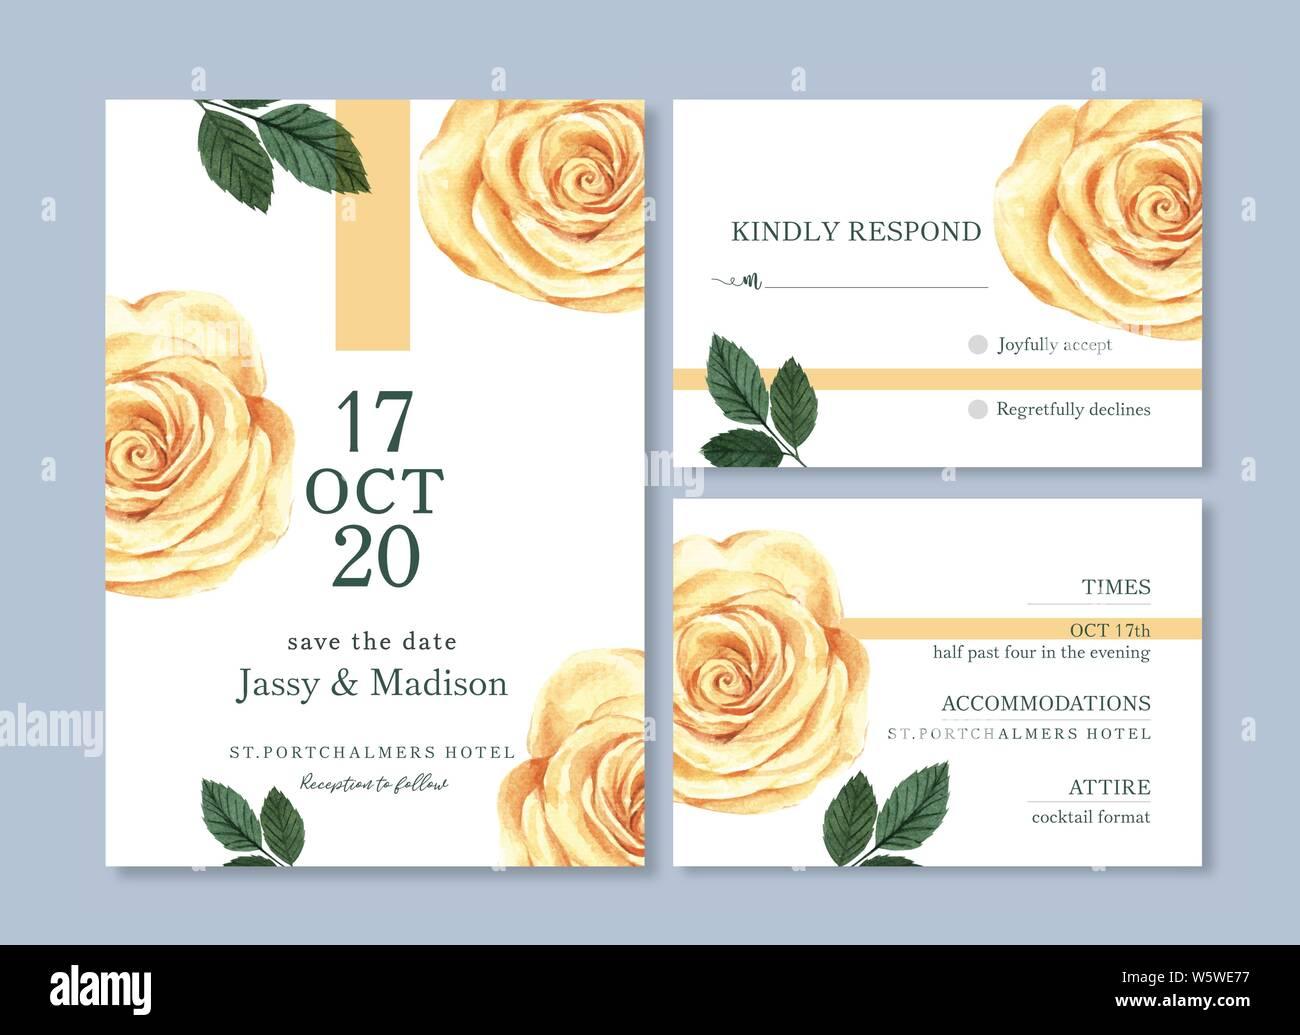 Tarjeta De Boda Flor Acuarela Gracias Tarjeta Invitación